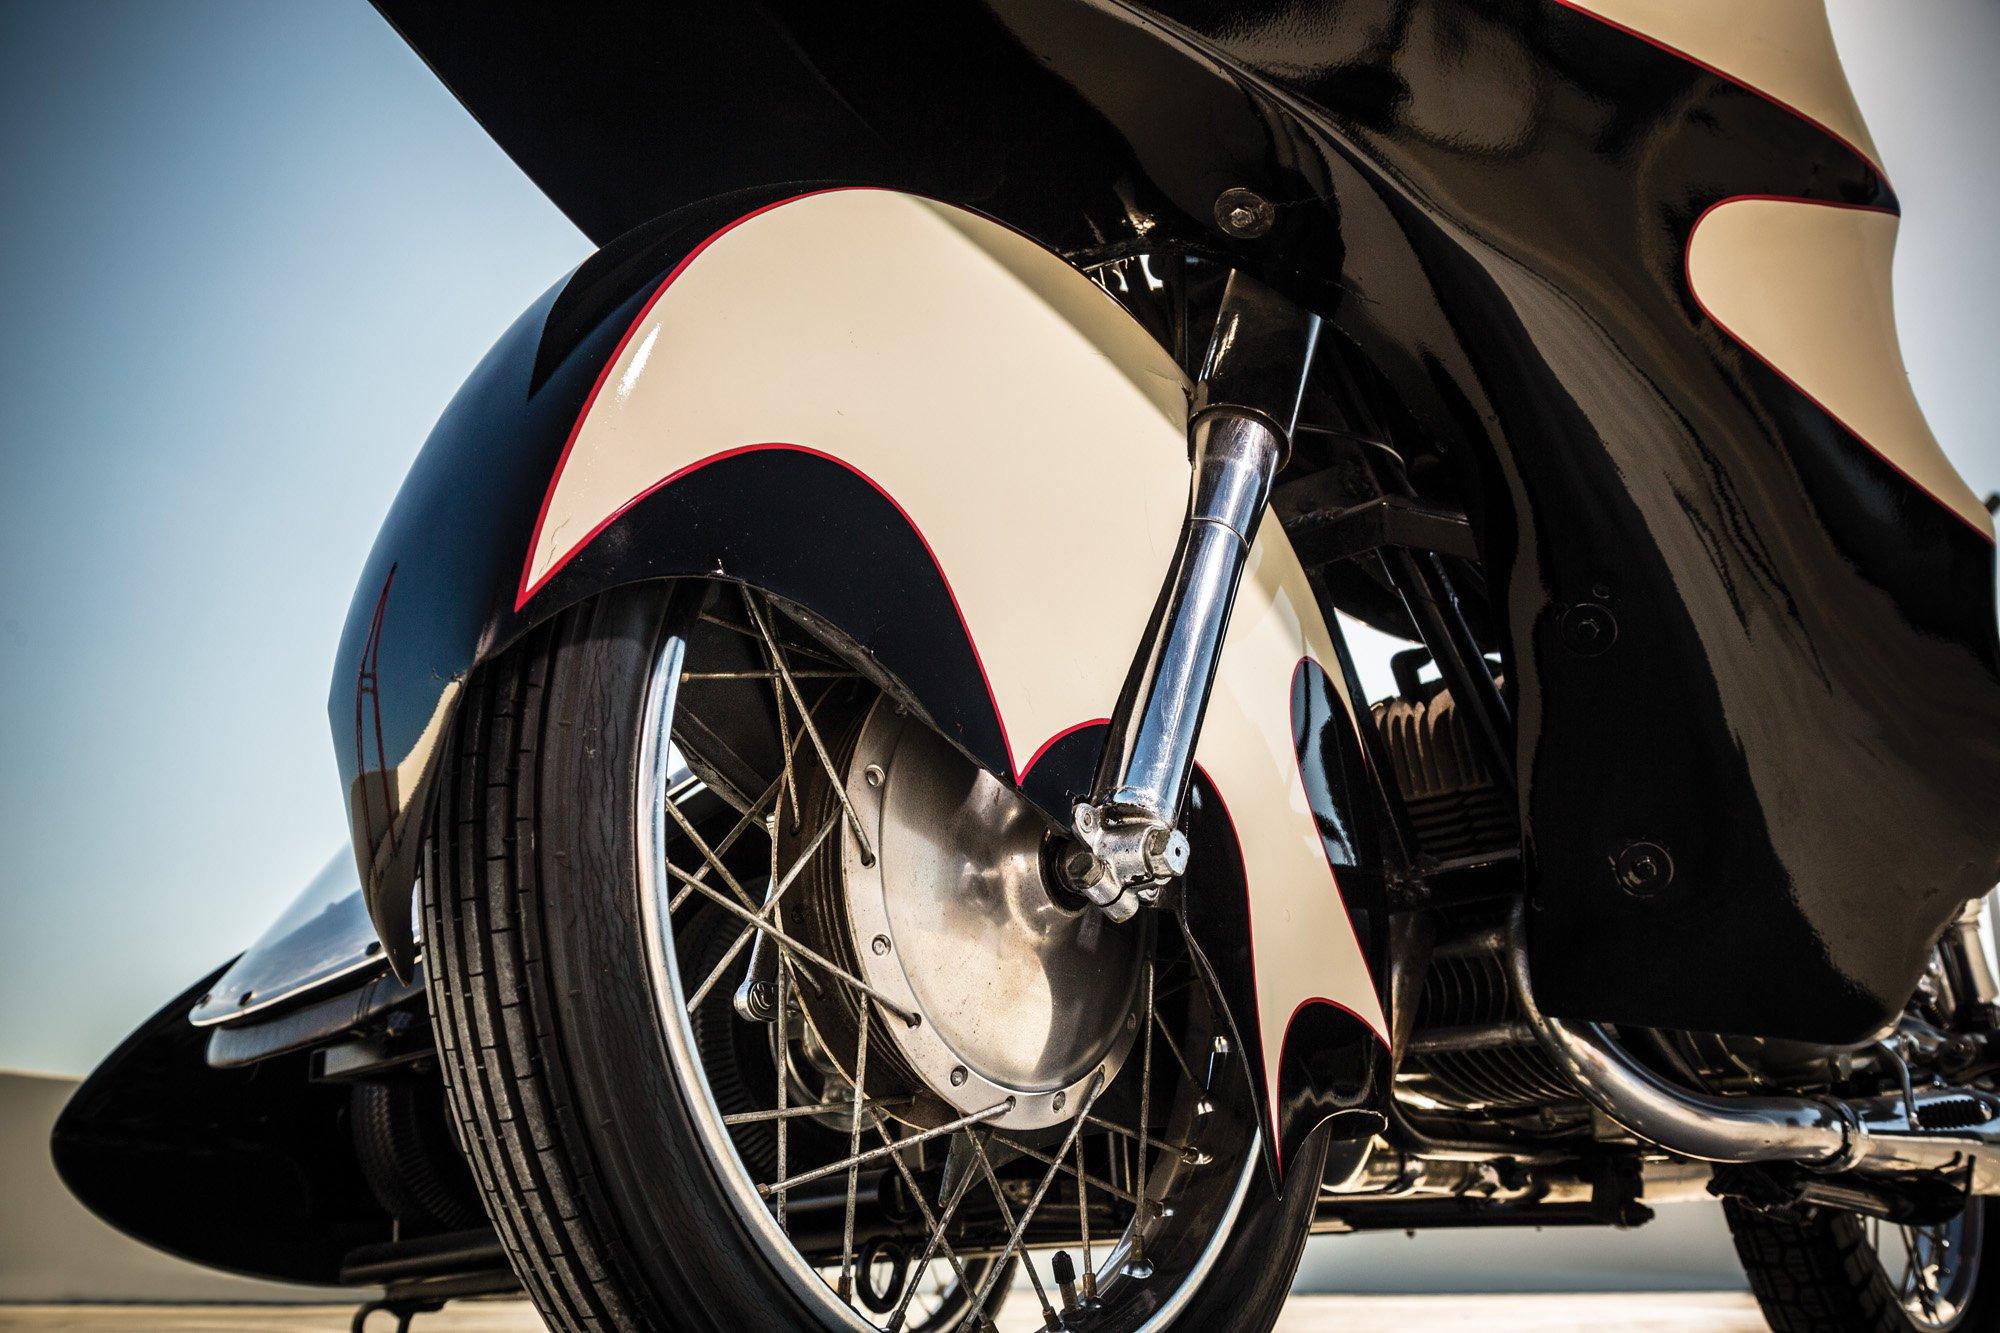 1966 Yamaha YDS-3 Batcycle 4.jpg